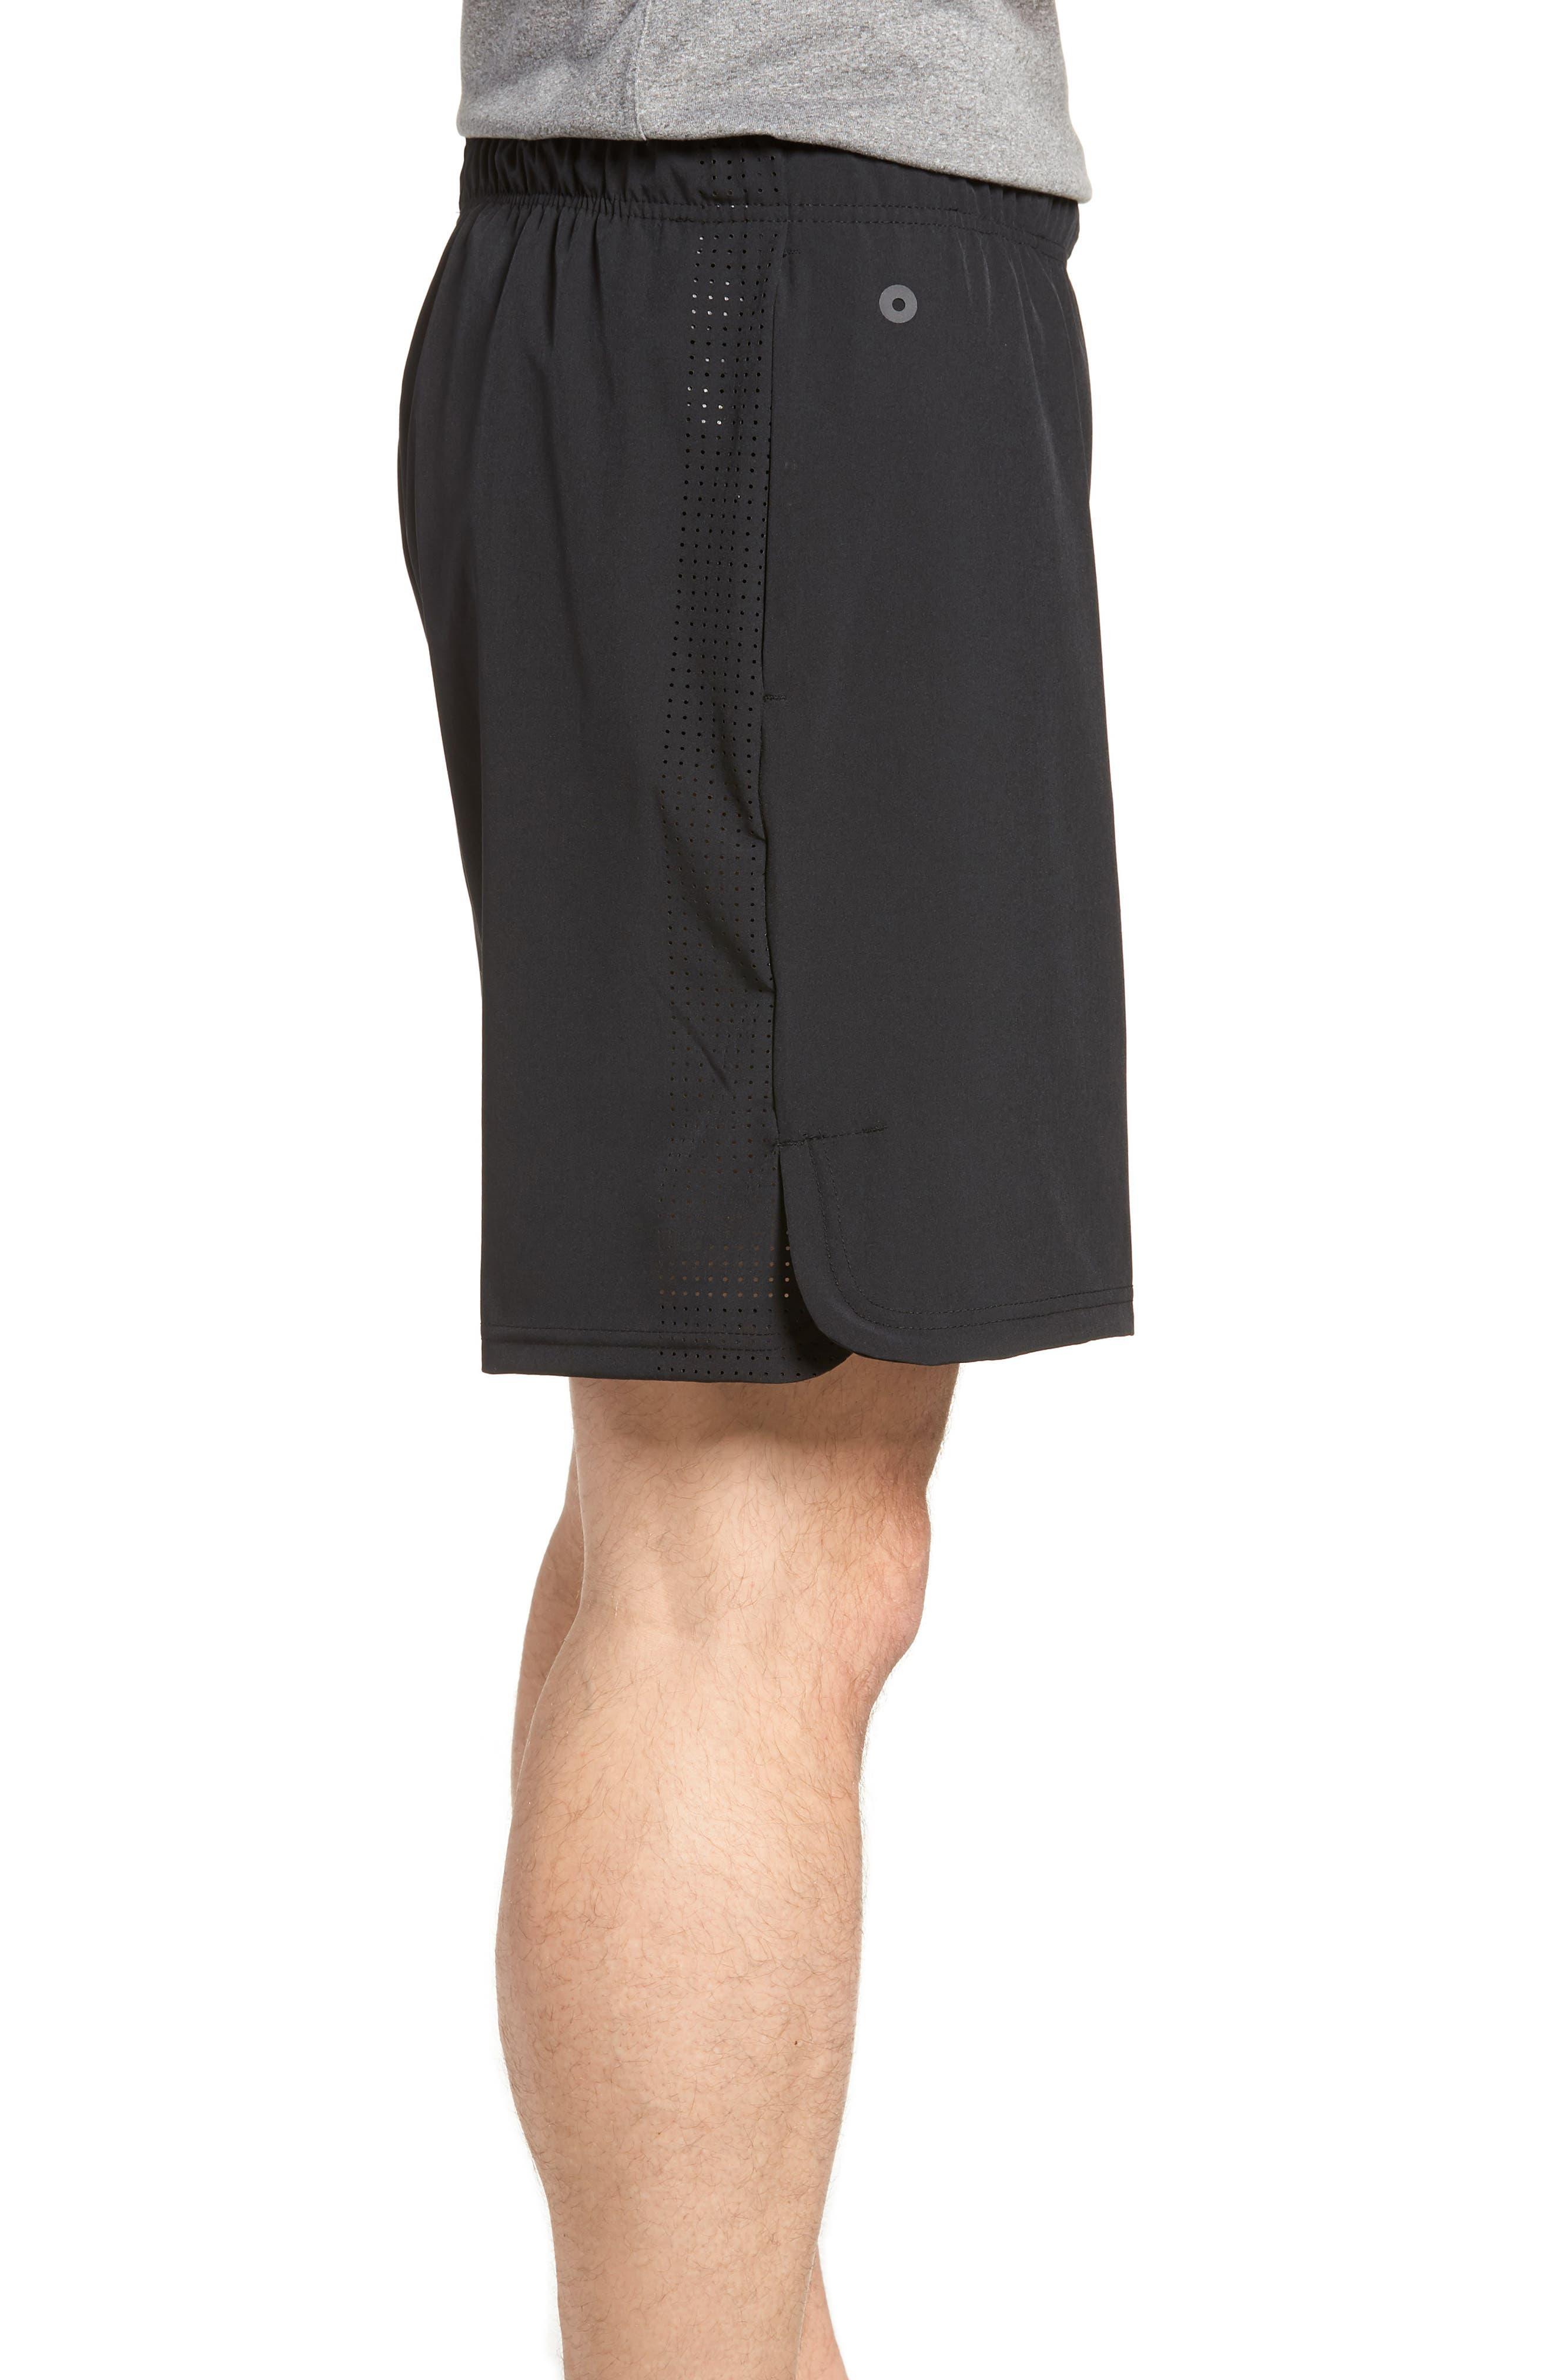 ZANEROBE Type 3 Tech Shorts,                             Alternate thumbnail 3, color,                             001